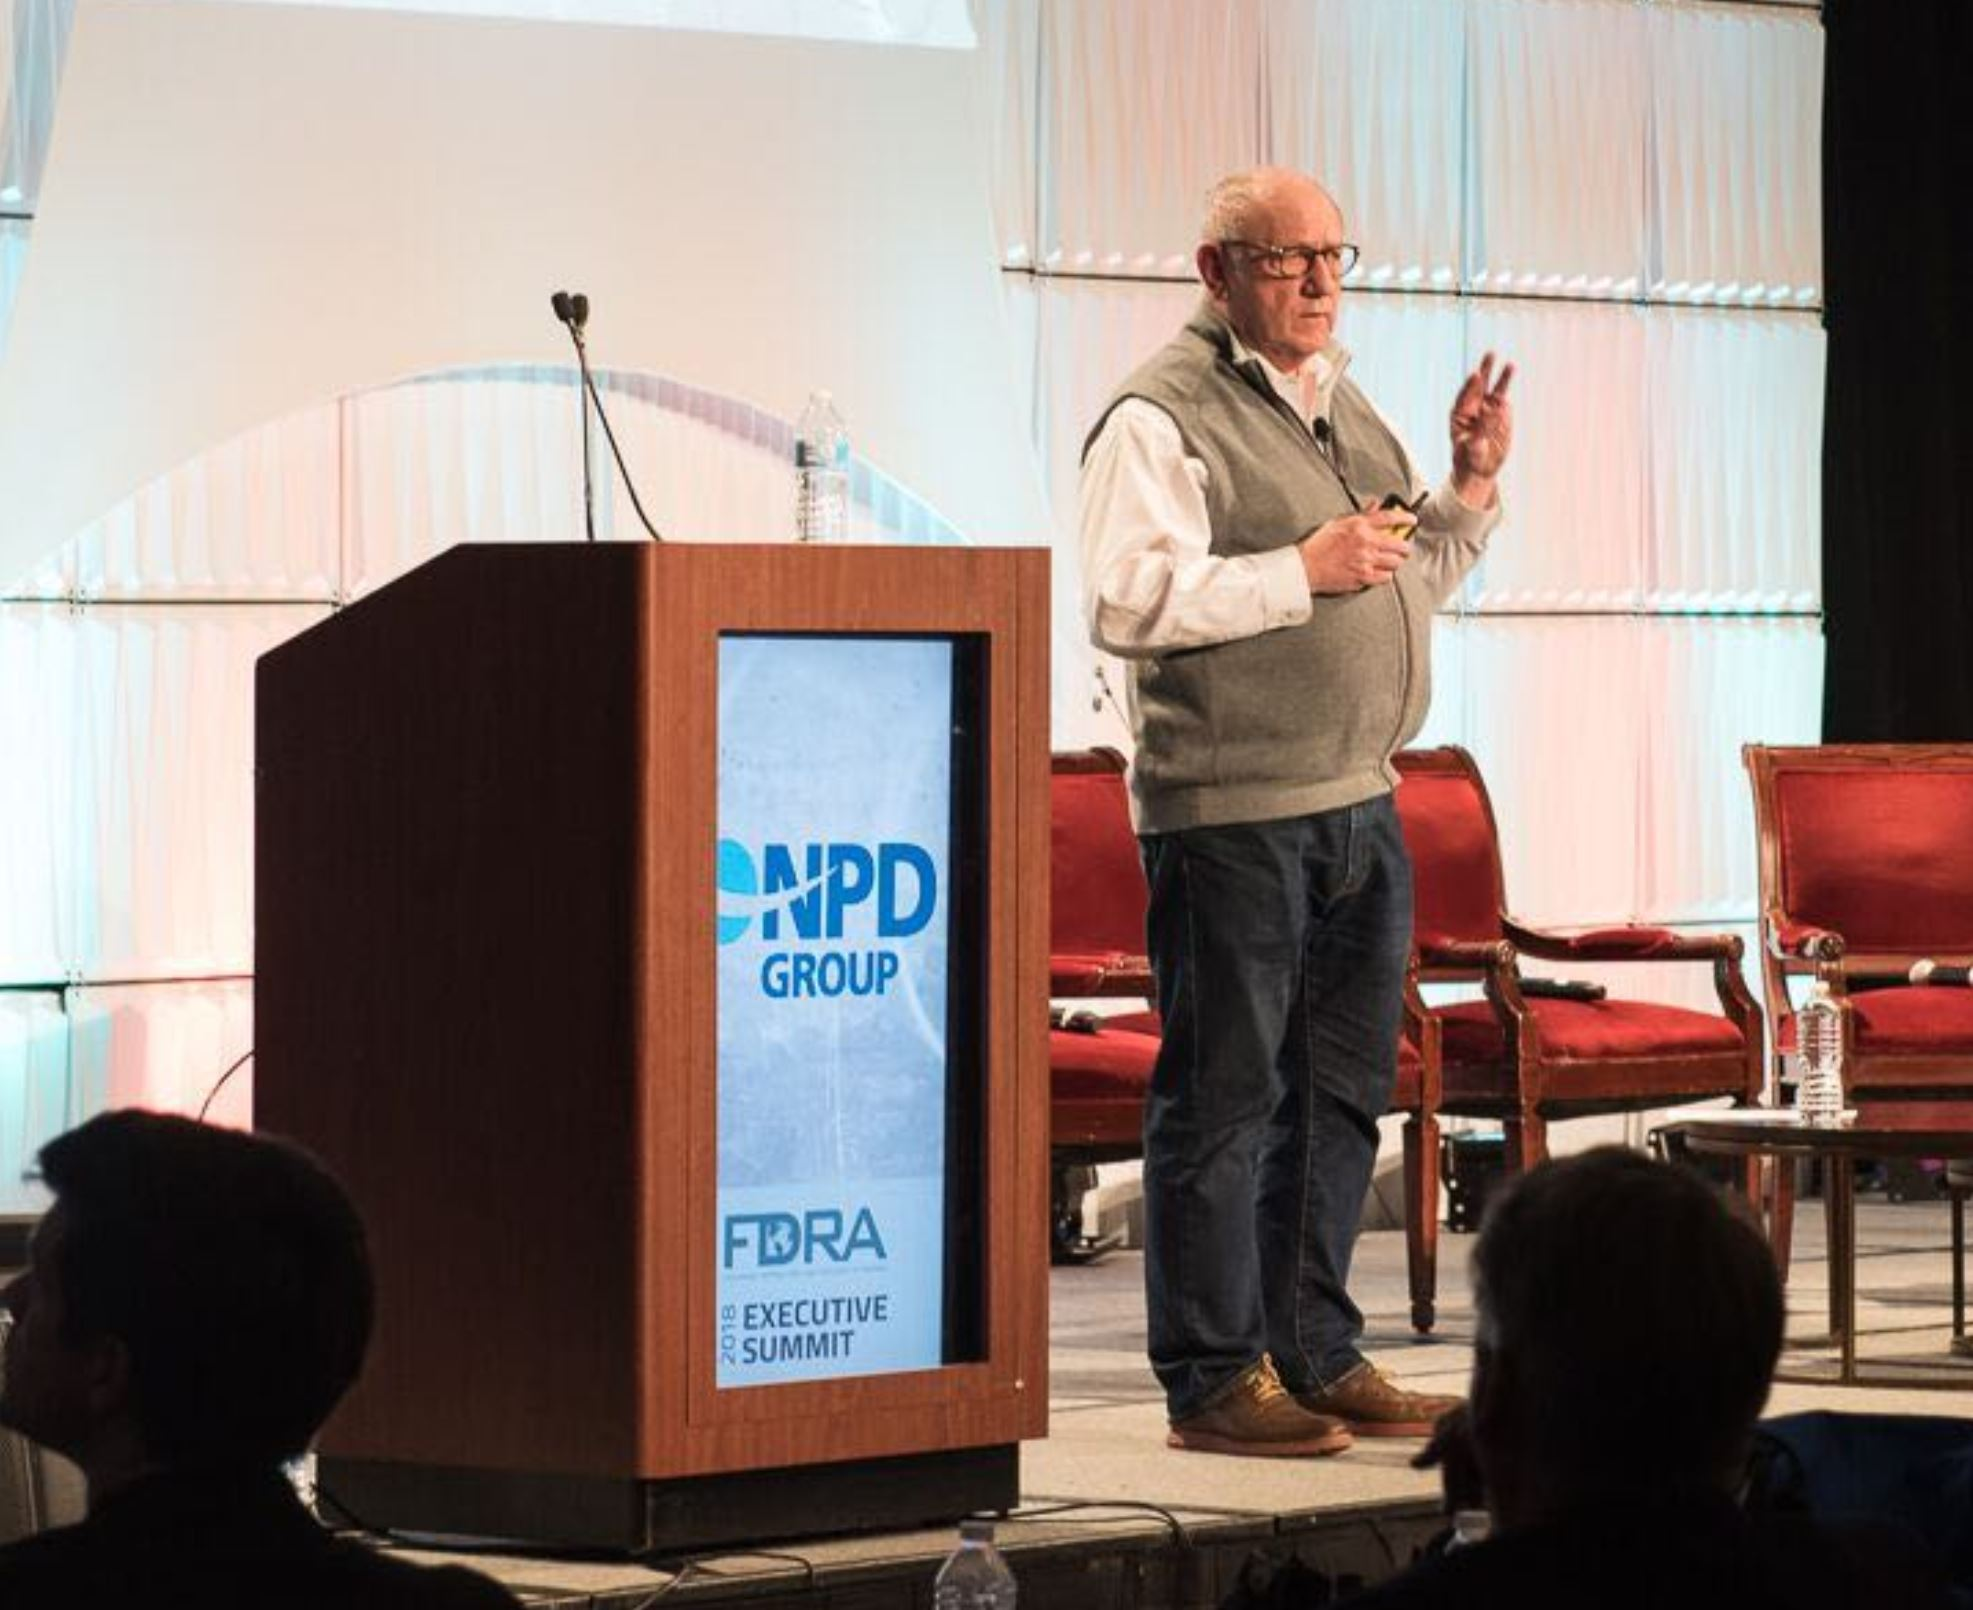 matt powell npd footwear industry trends 2018 FDRA executive summit